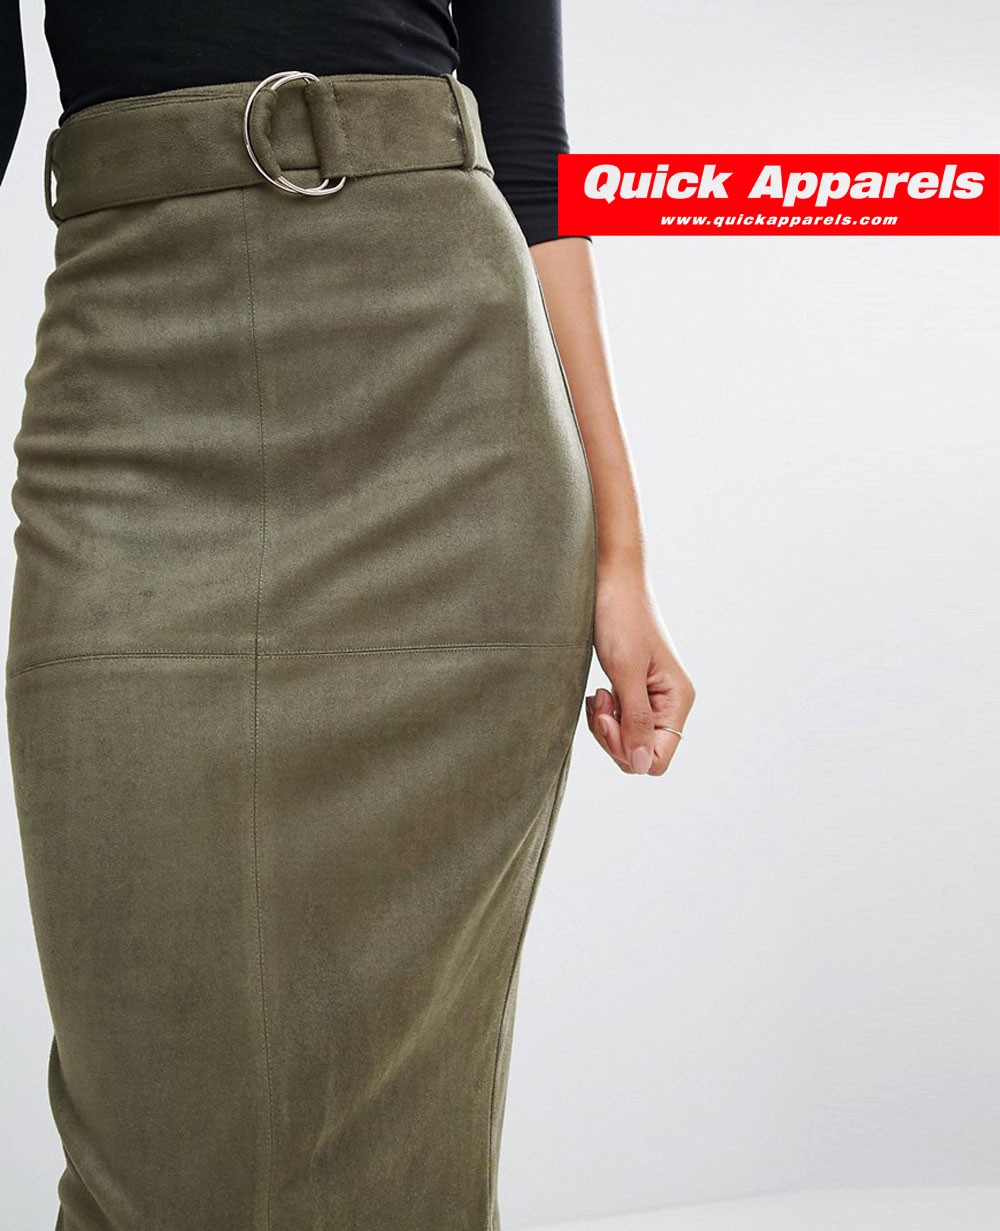 9c81f16729 Women Long Suedette Pencil Women Skirt